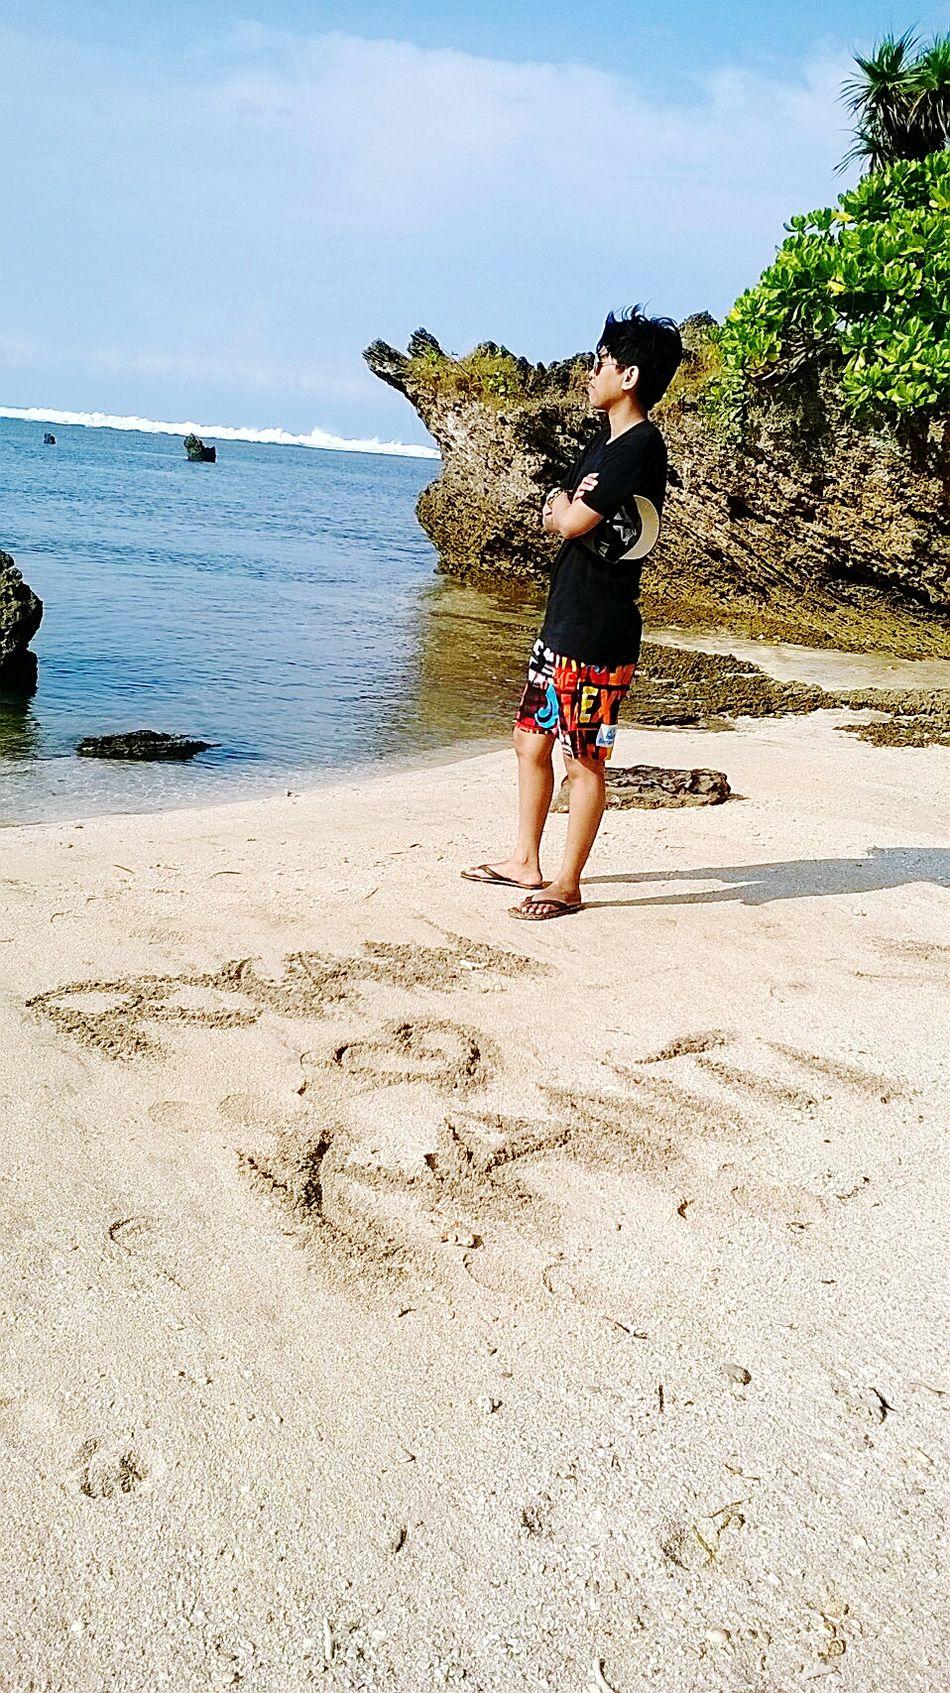 In Santolo Beach Garut Island Wonderful Day Great Performance - My Necklace Has Our Names On It ❤ SurtiKANTHIwibowo And RYANoztaryhardyansyass